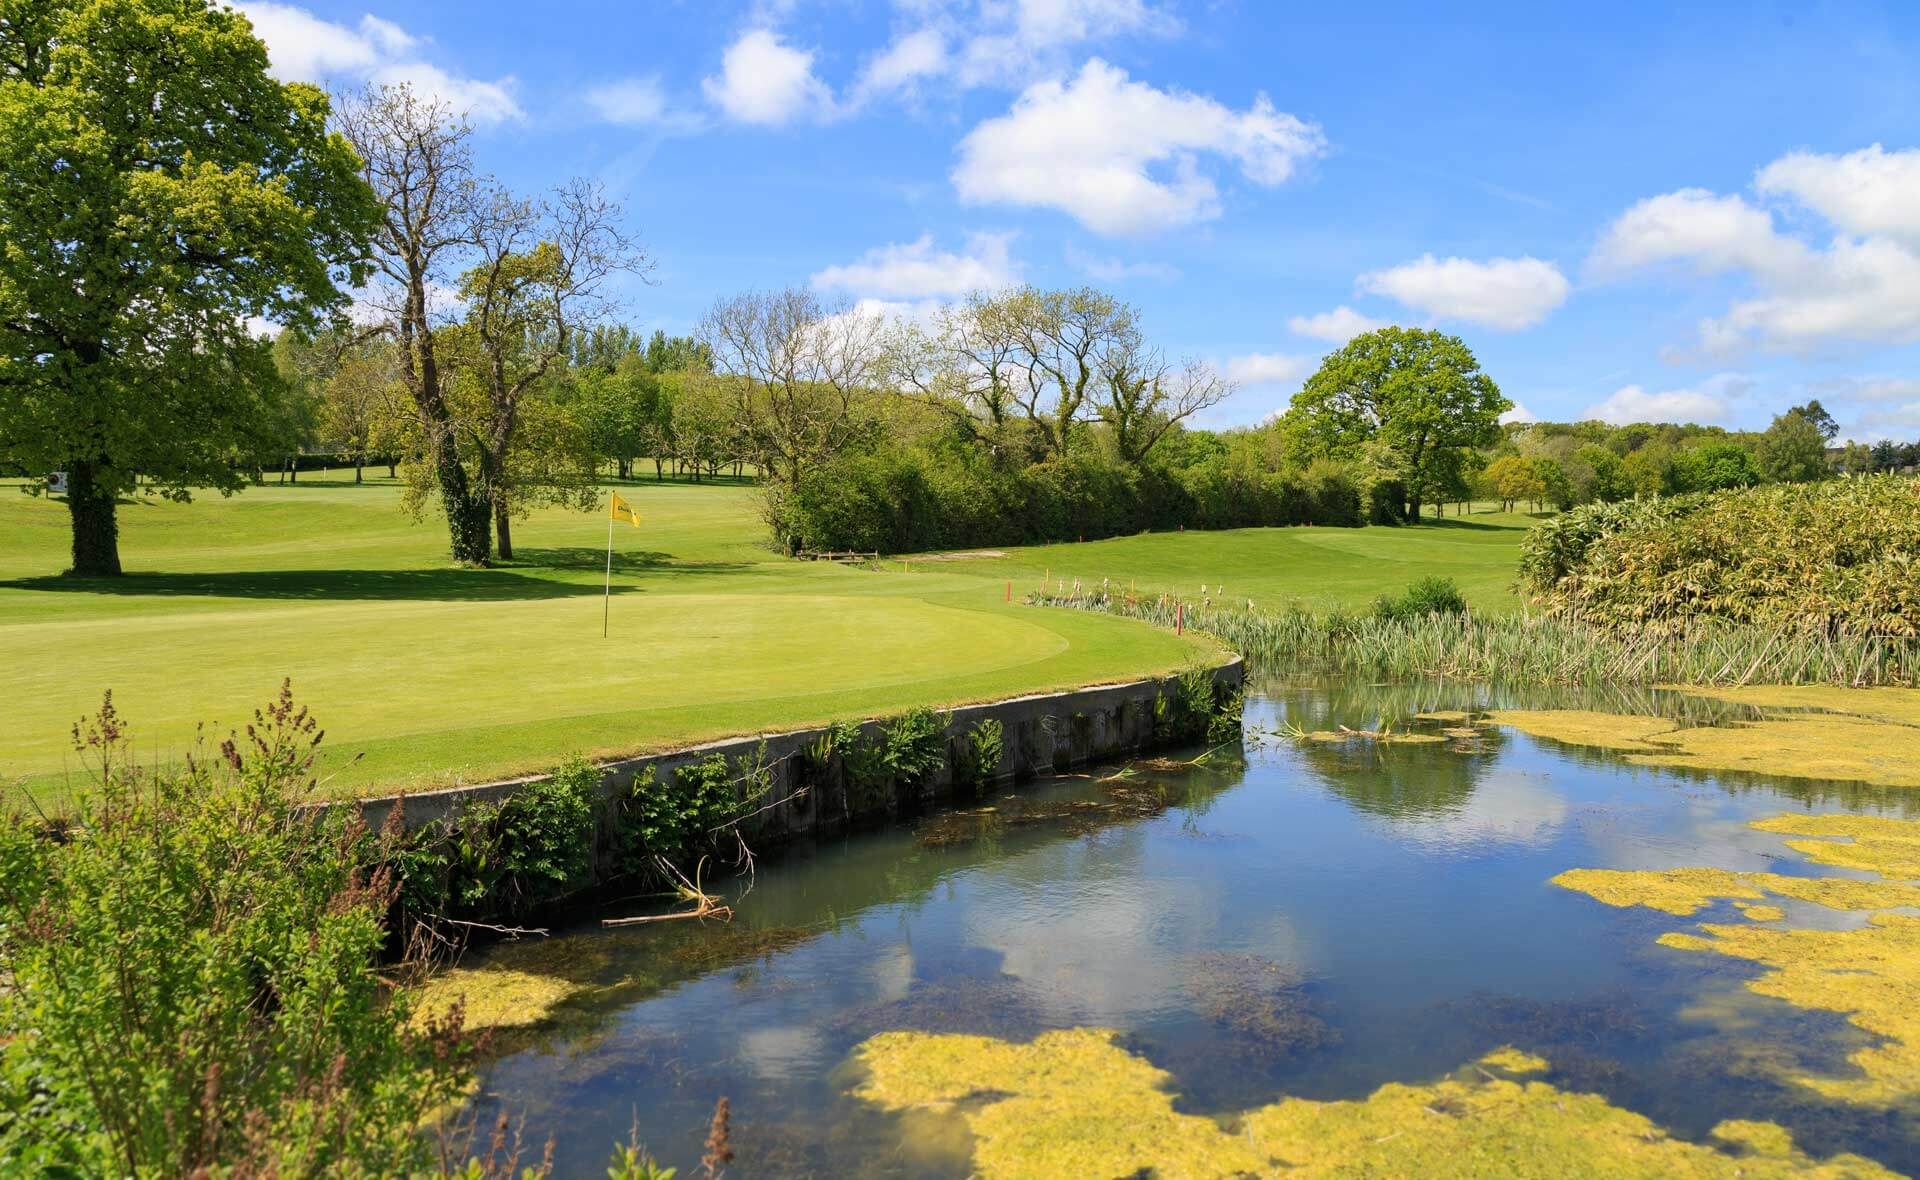 Dainton Park Golf Club 8